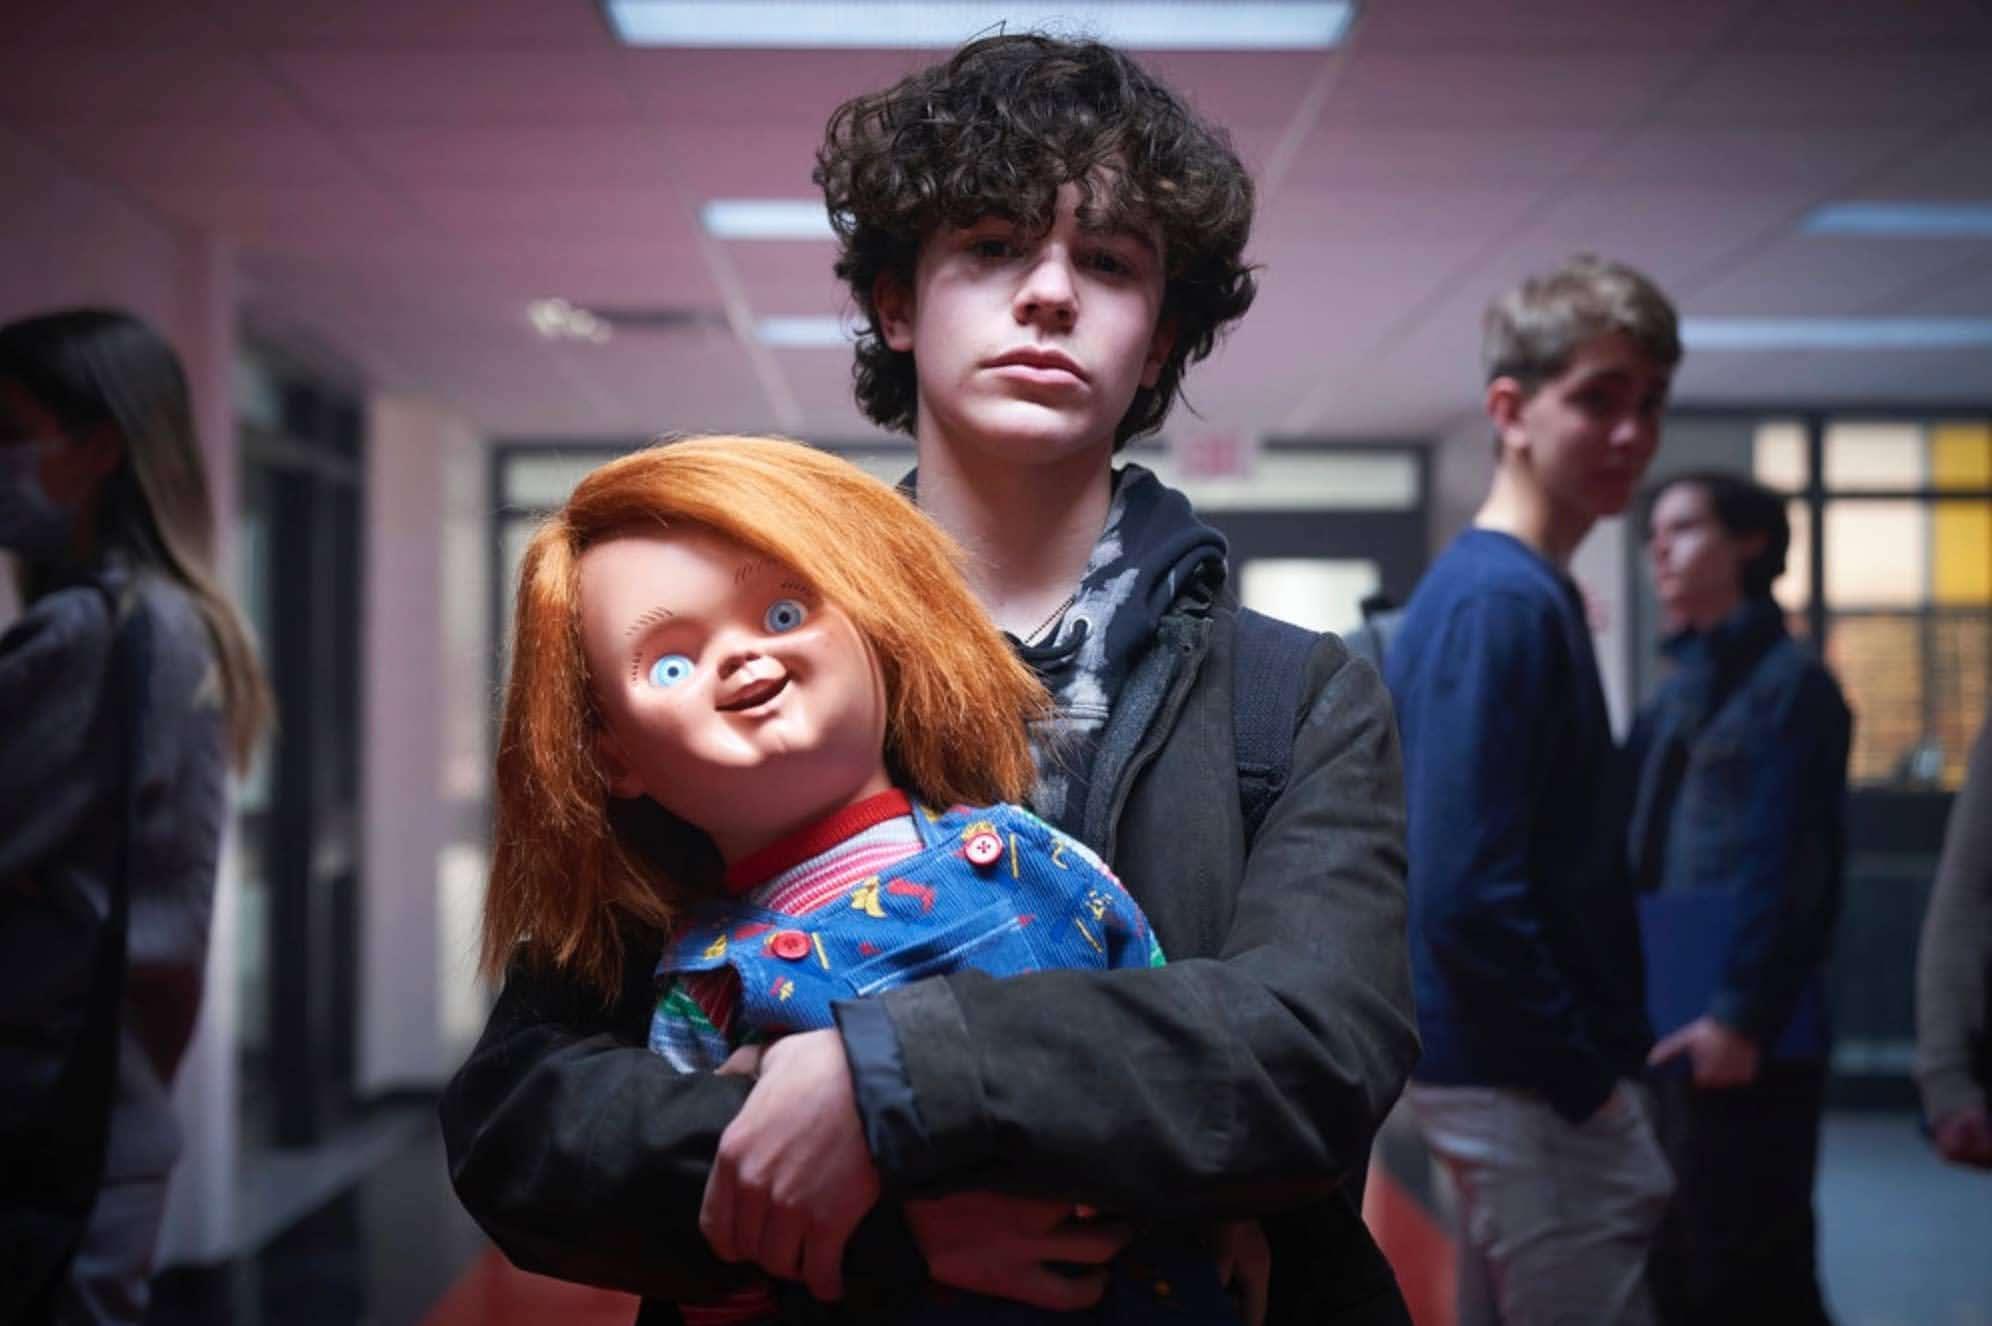 New Trailer for 'Child's Play'' TV series 'Chucky' : 恐怖の坊やの人形の人気ホラー映画「チャイルド・プレイ」の通算第9作めにあたるテレビシリーズ化「チャッキー」が、ファン待望の恐ろしい展開に期待を抱かせる最終版の予告編をリリース ! !